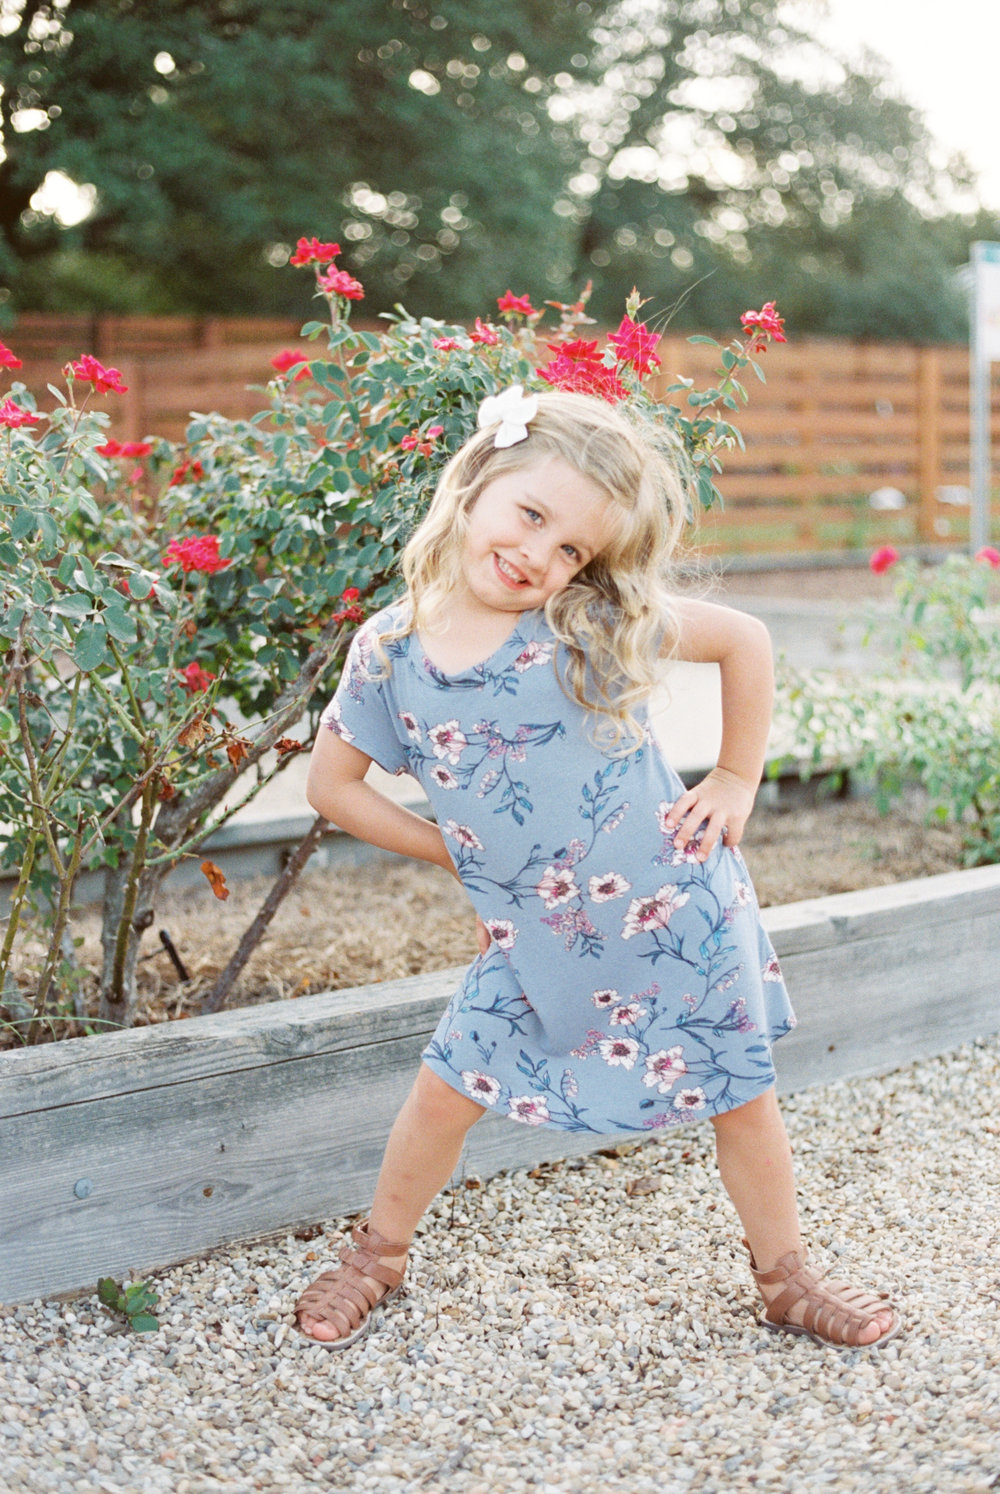 CarolynnSeibertPhotography--AnnieReese1YearOld47682_09.jpg